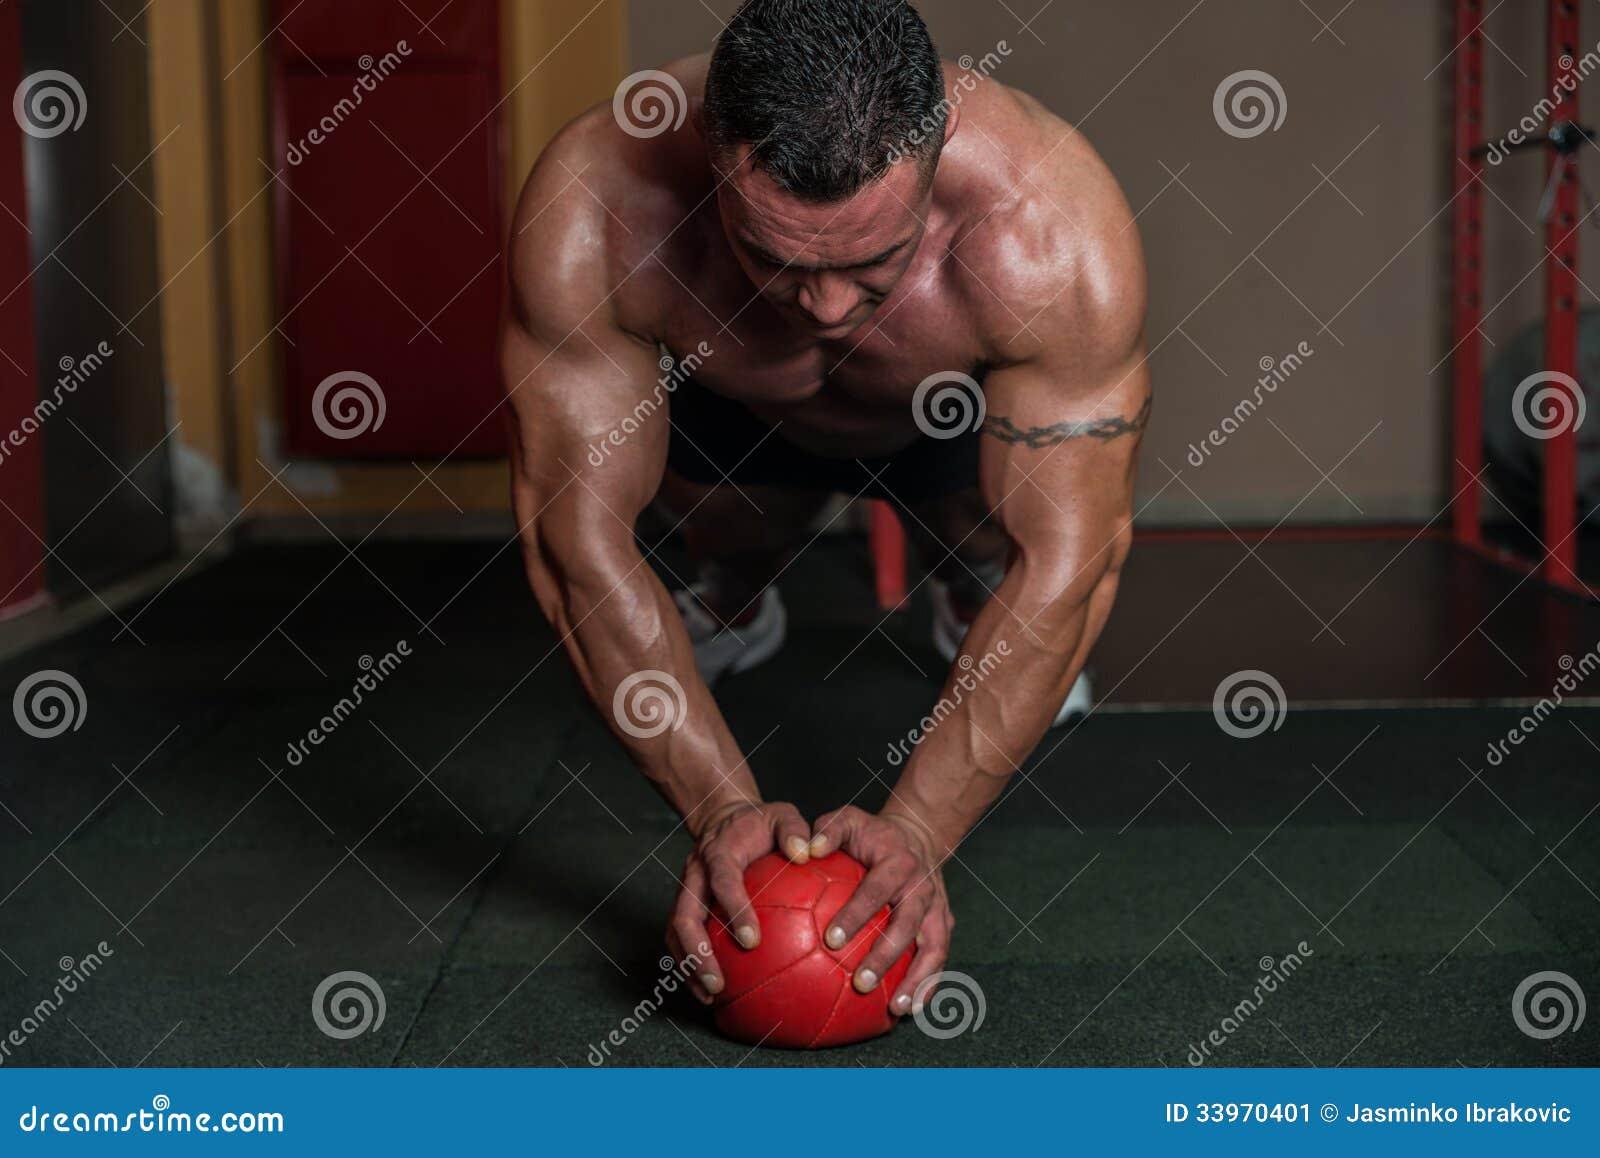 Push-ups On Medicine Ball Stock Image - Image: 33970401